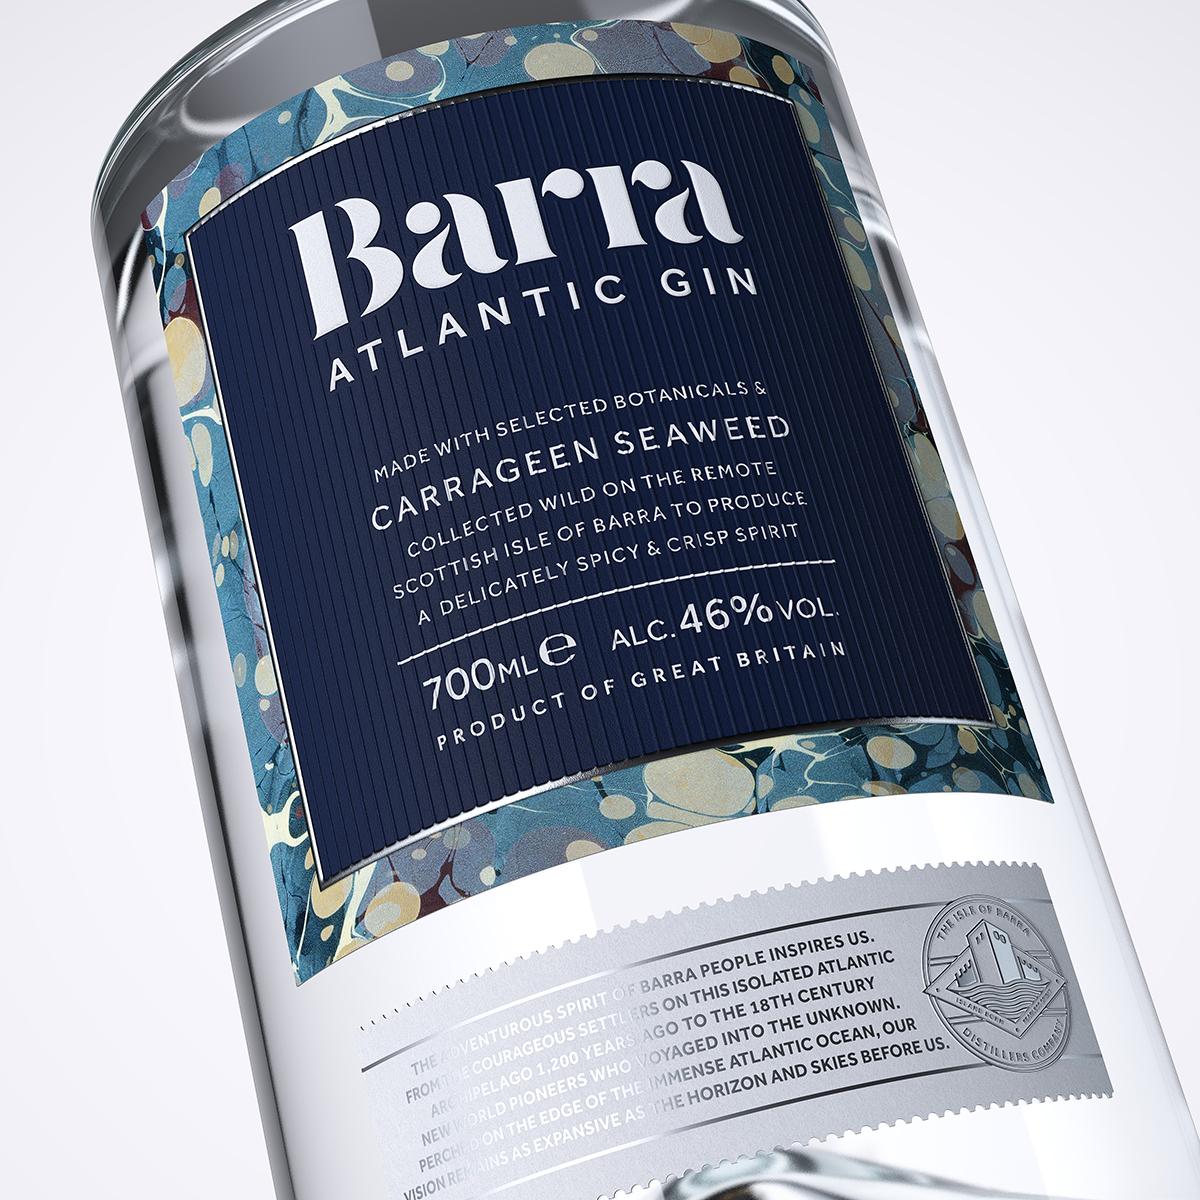 Barra_Atlantic_Gin_6